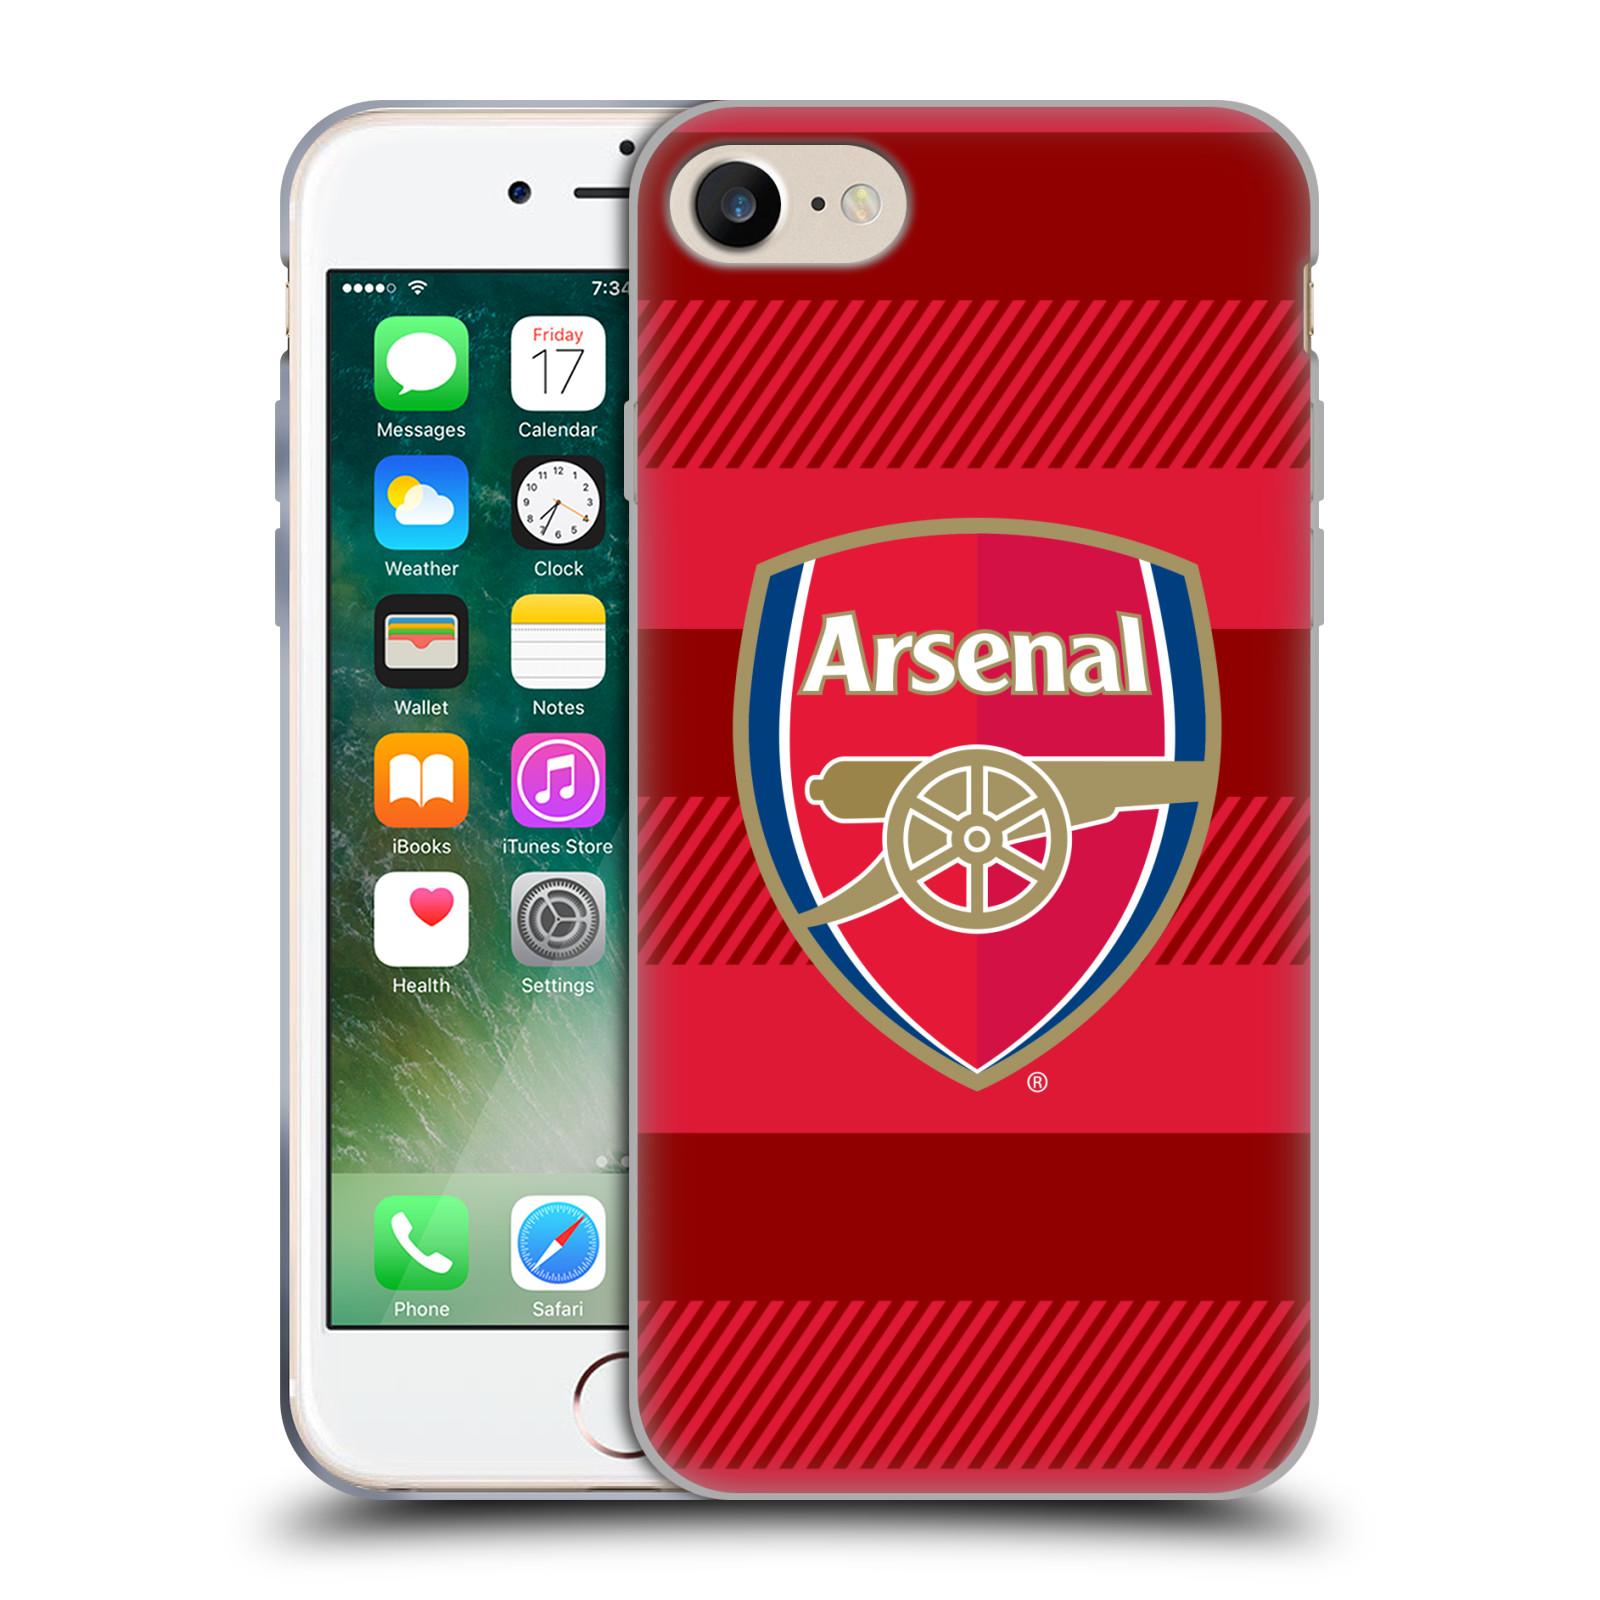 Silikonové pouzdro na mobil Apple iPhone 8 - Head Case - Arsenal FC - Logo s pruhy